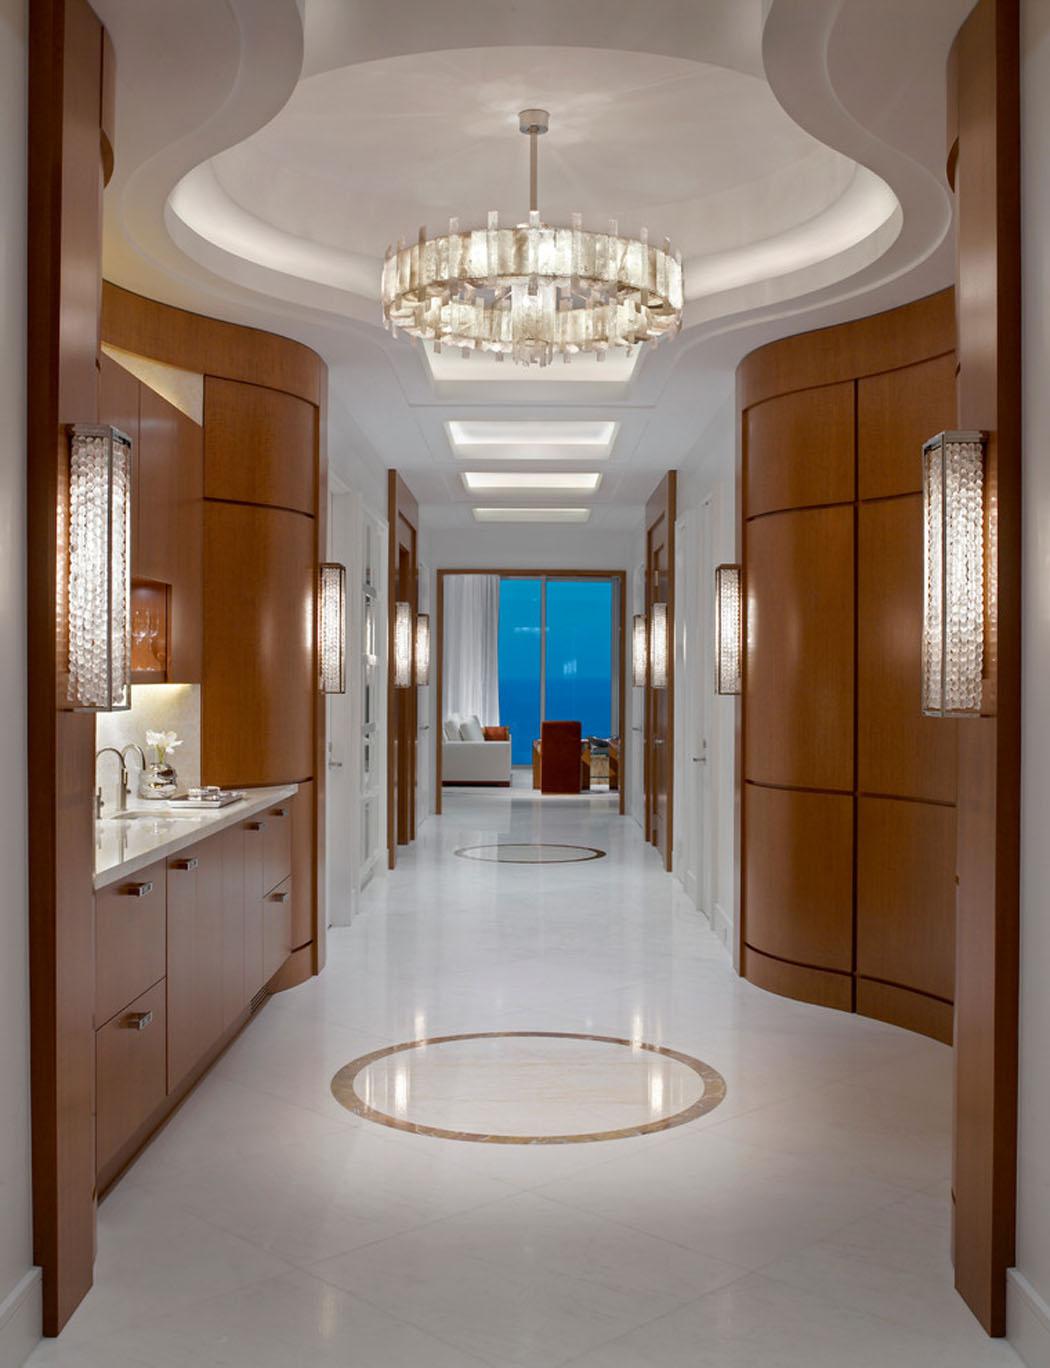 R sidence de vacances luxueuse miami avec splendide vue - Appartement de standing burgos design ...